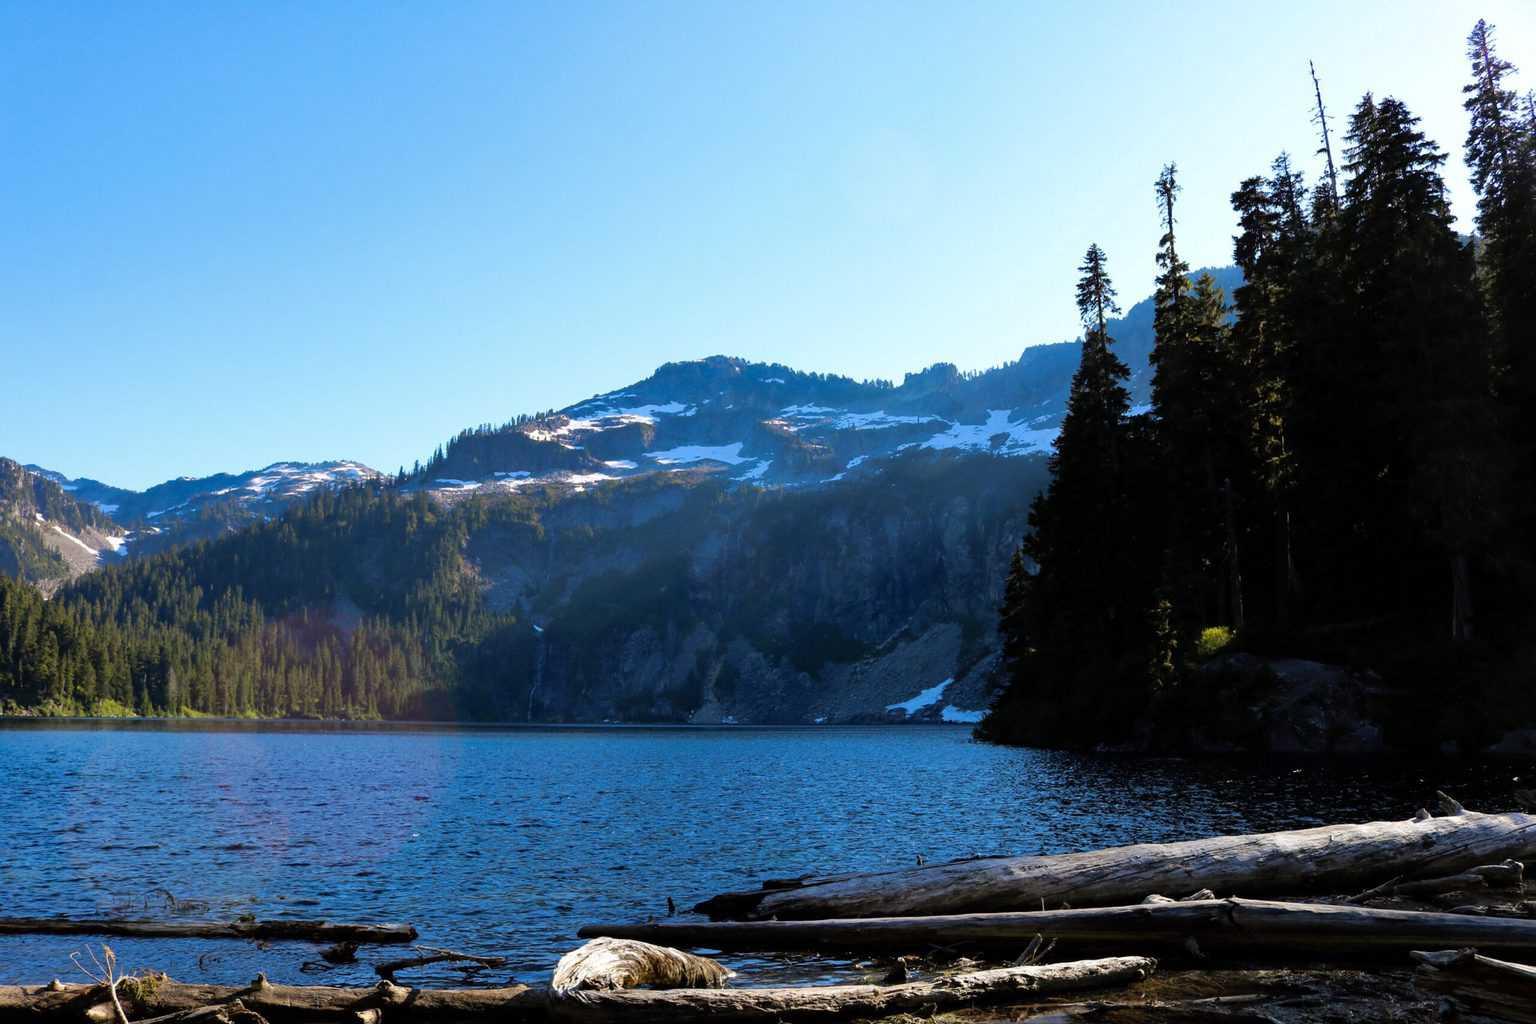 Photo of a high-mountain lake in the Cascade Range in Washington.